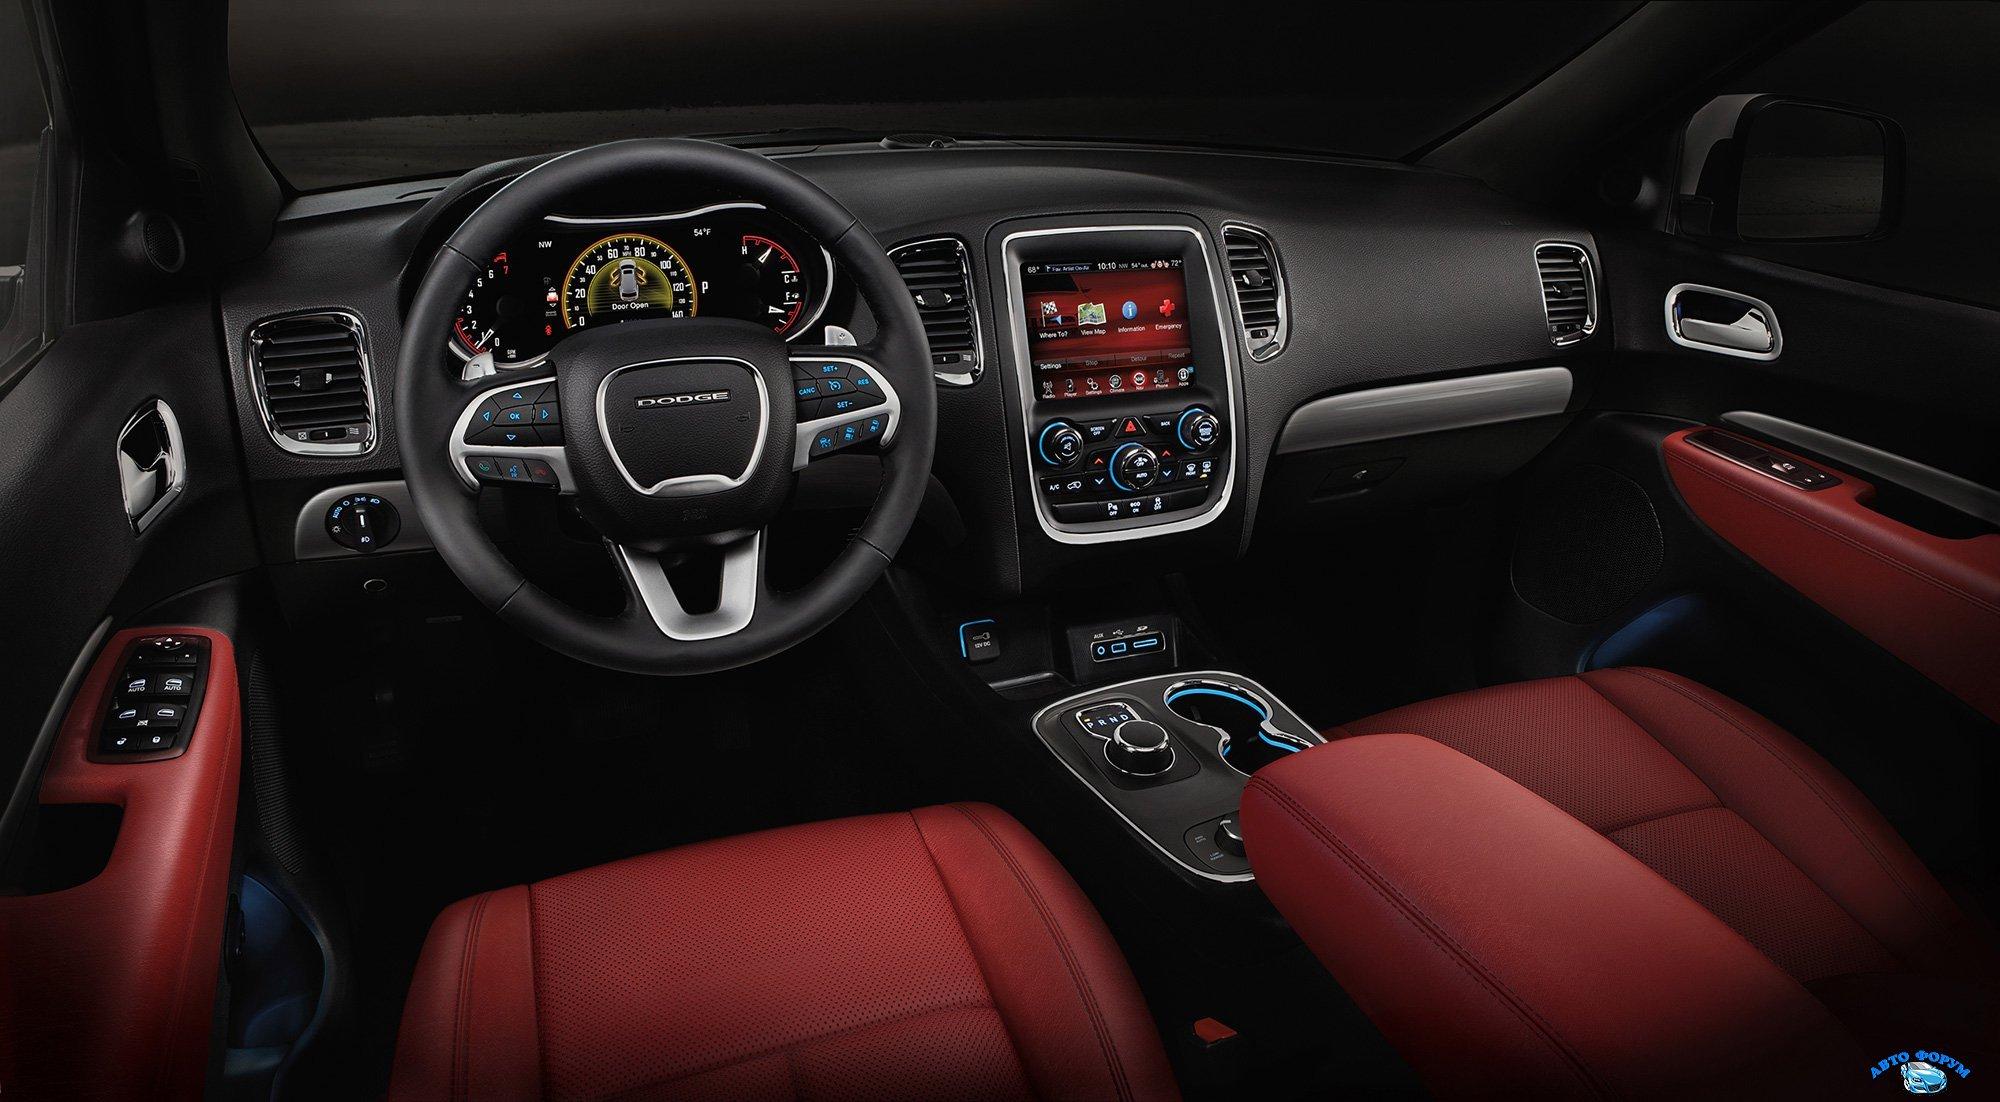 dodge-durango-red-leather-interior-02.jpg